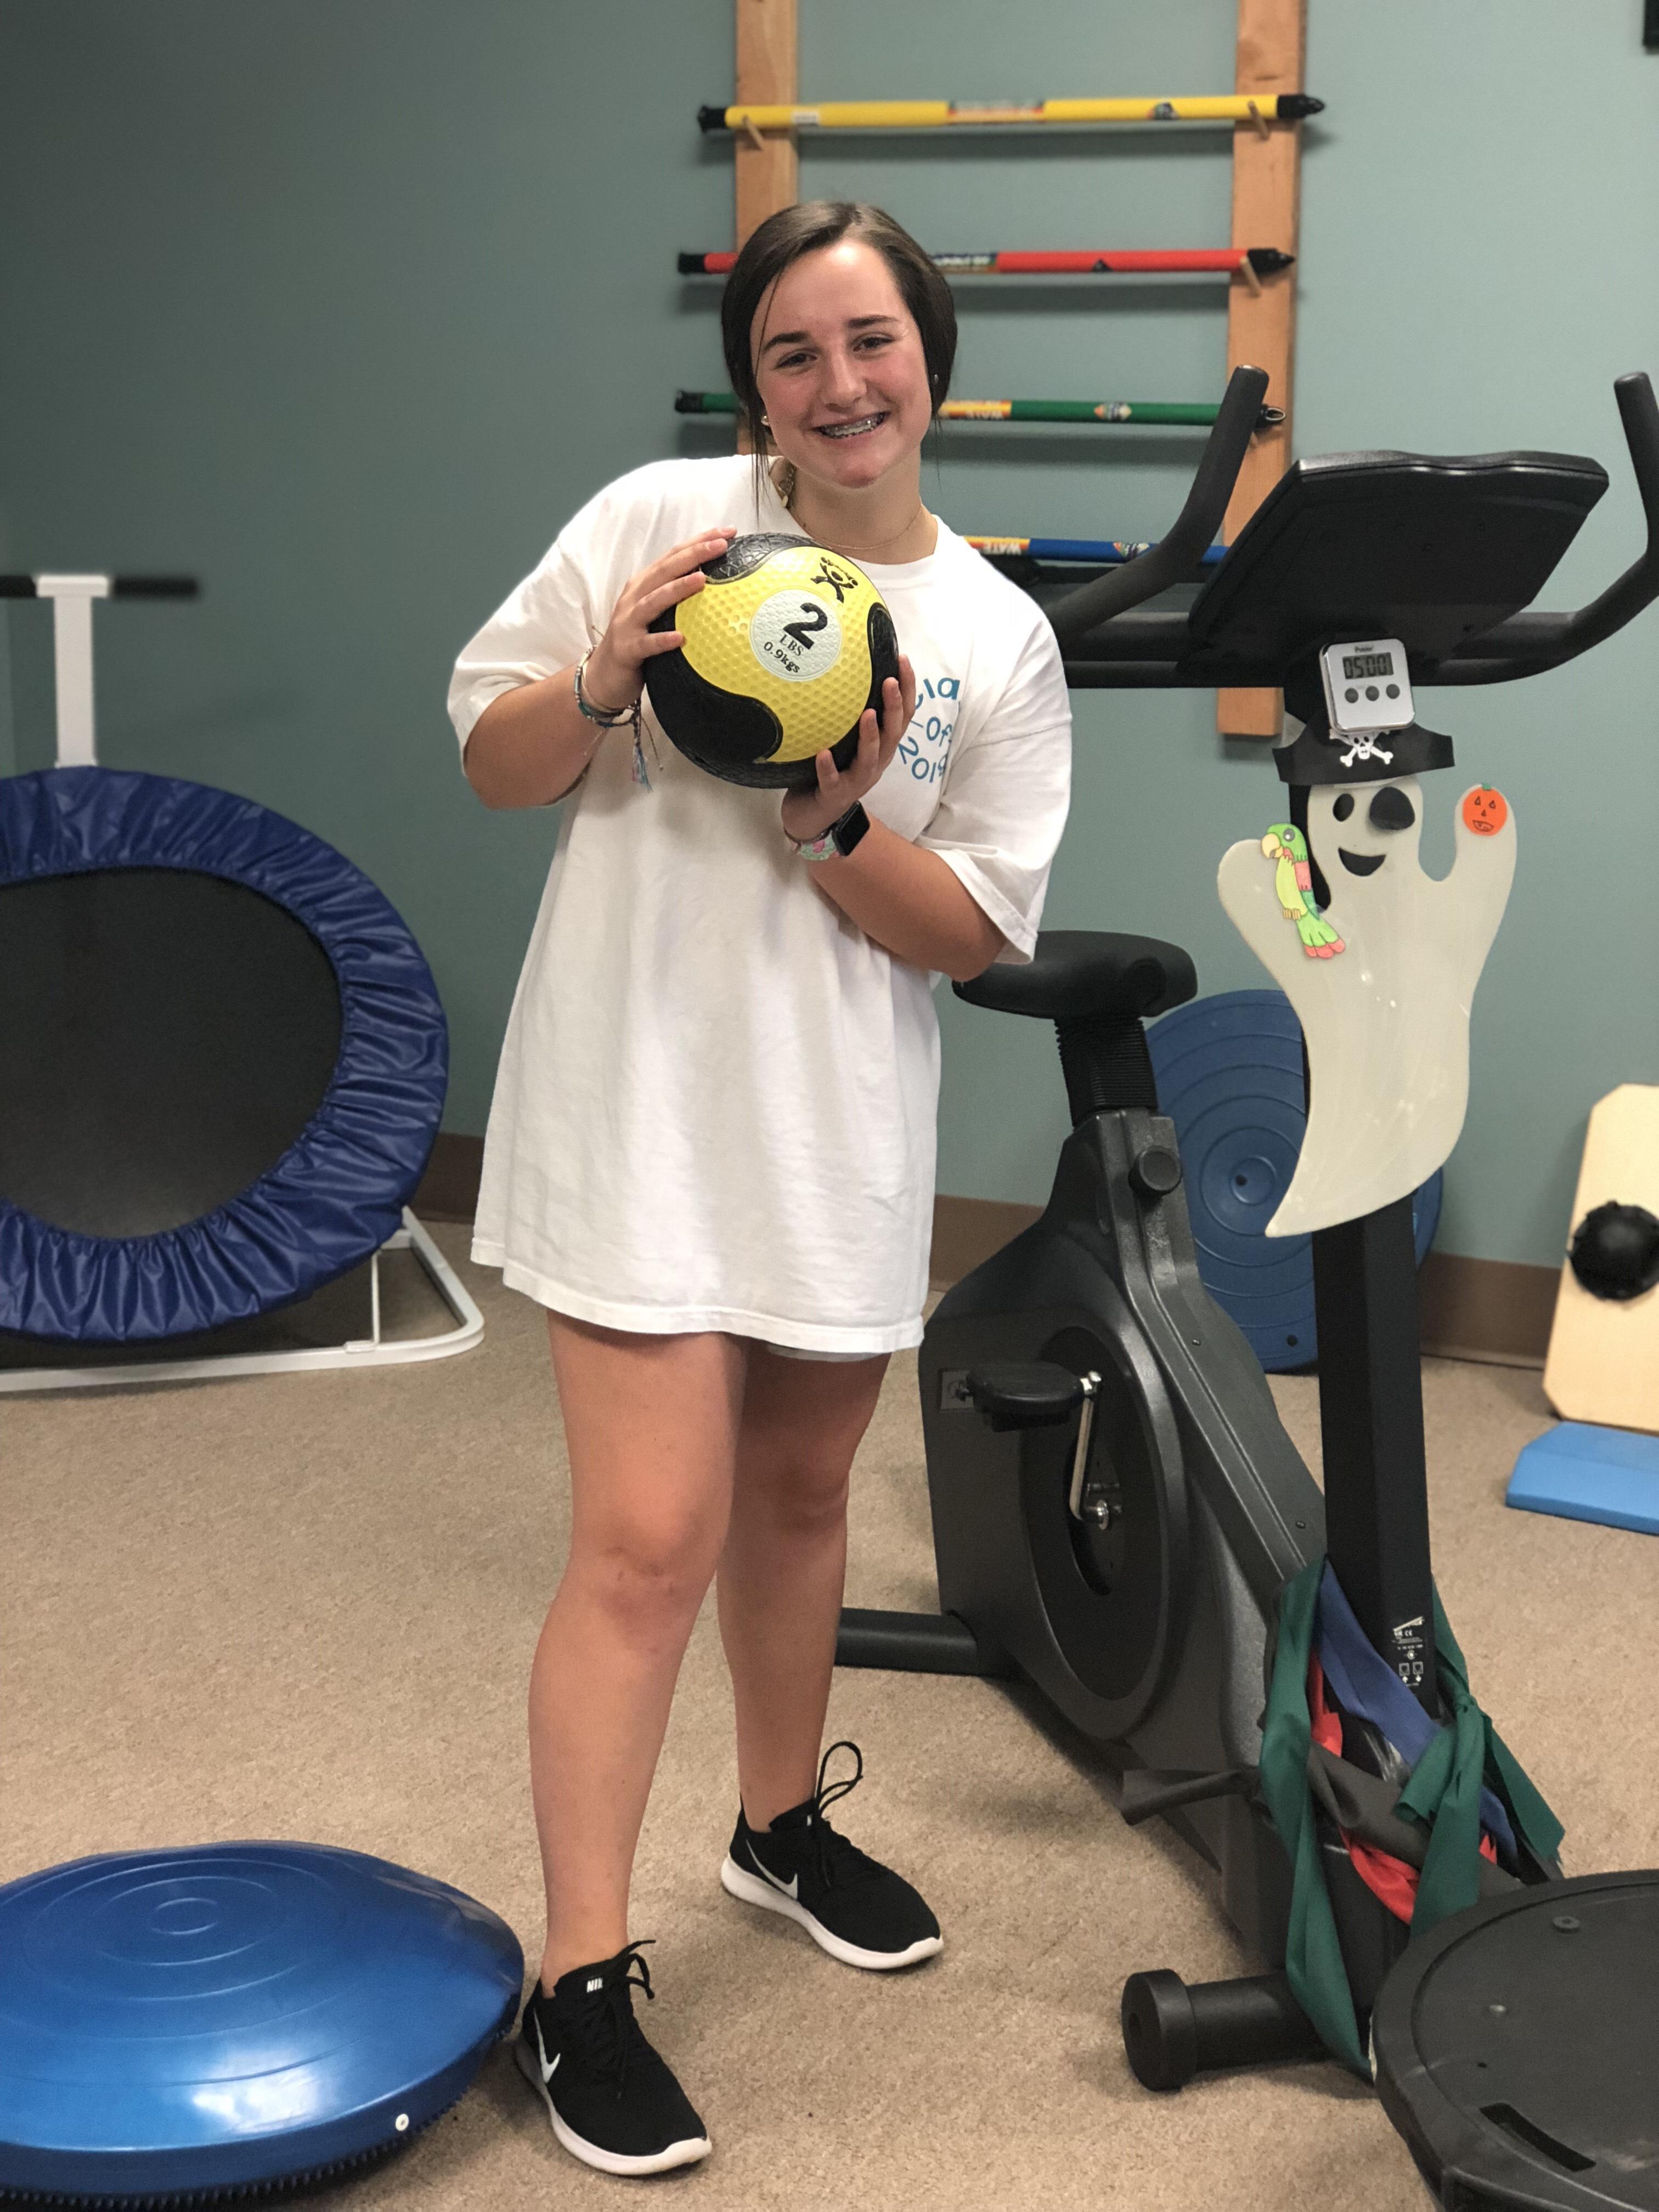 Raileigh Lyerly - Athlete of the Month for Encore Rehabilitation-Long Beach - #EncoreRehab #IamEncore